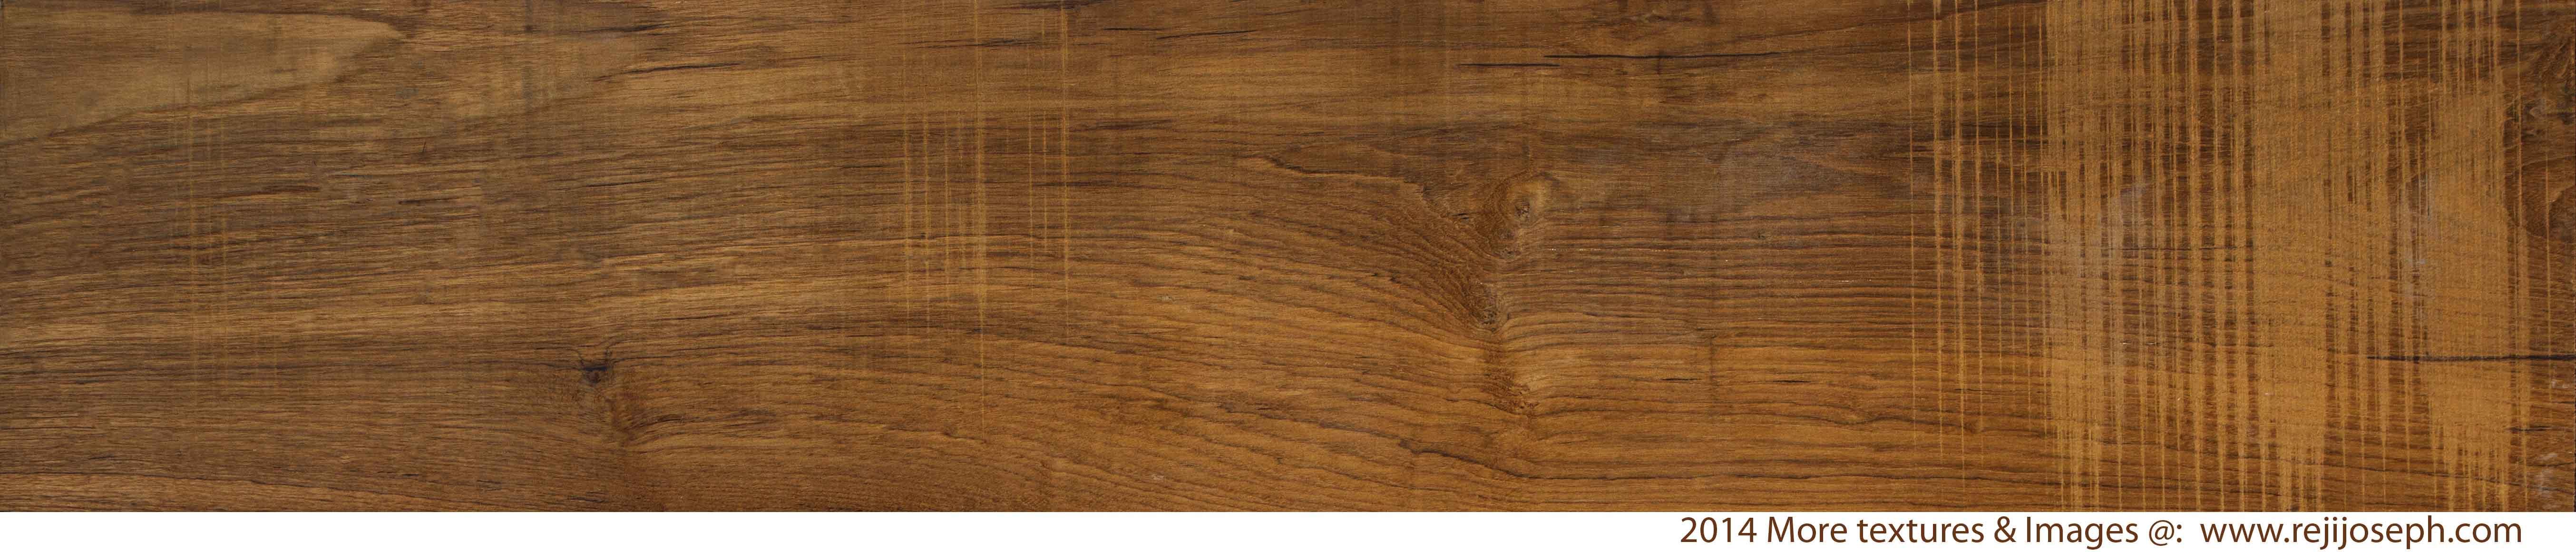 Plane Wood texture 00008